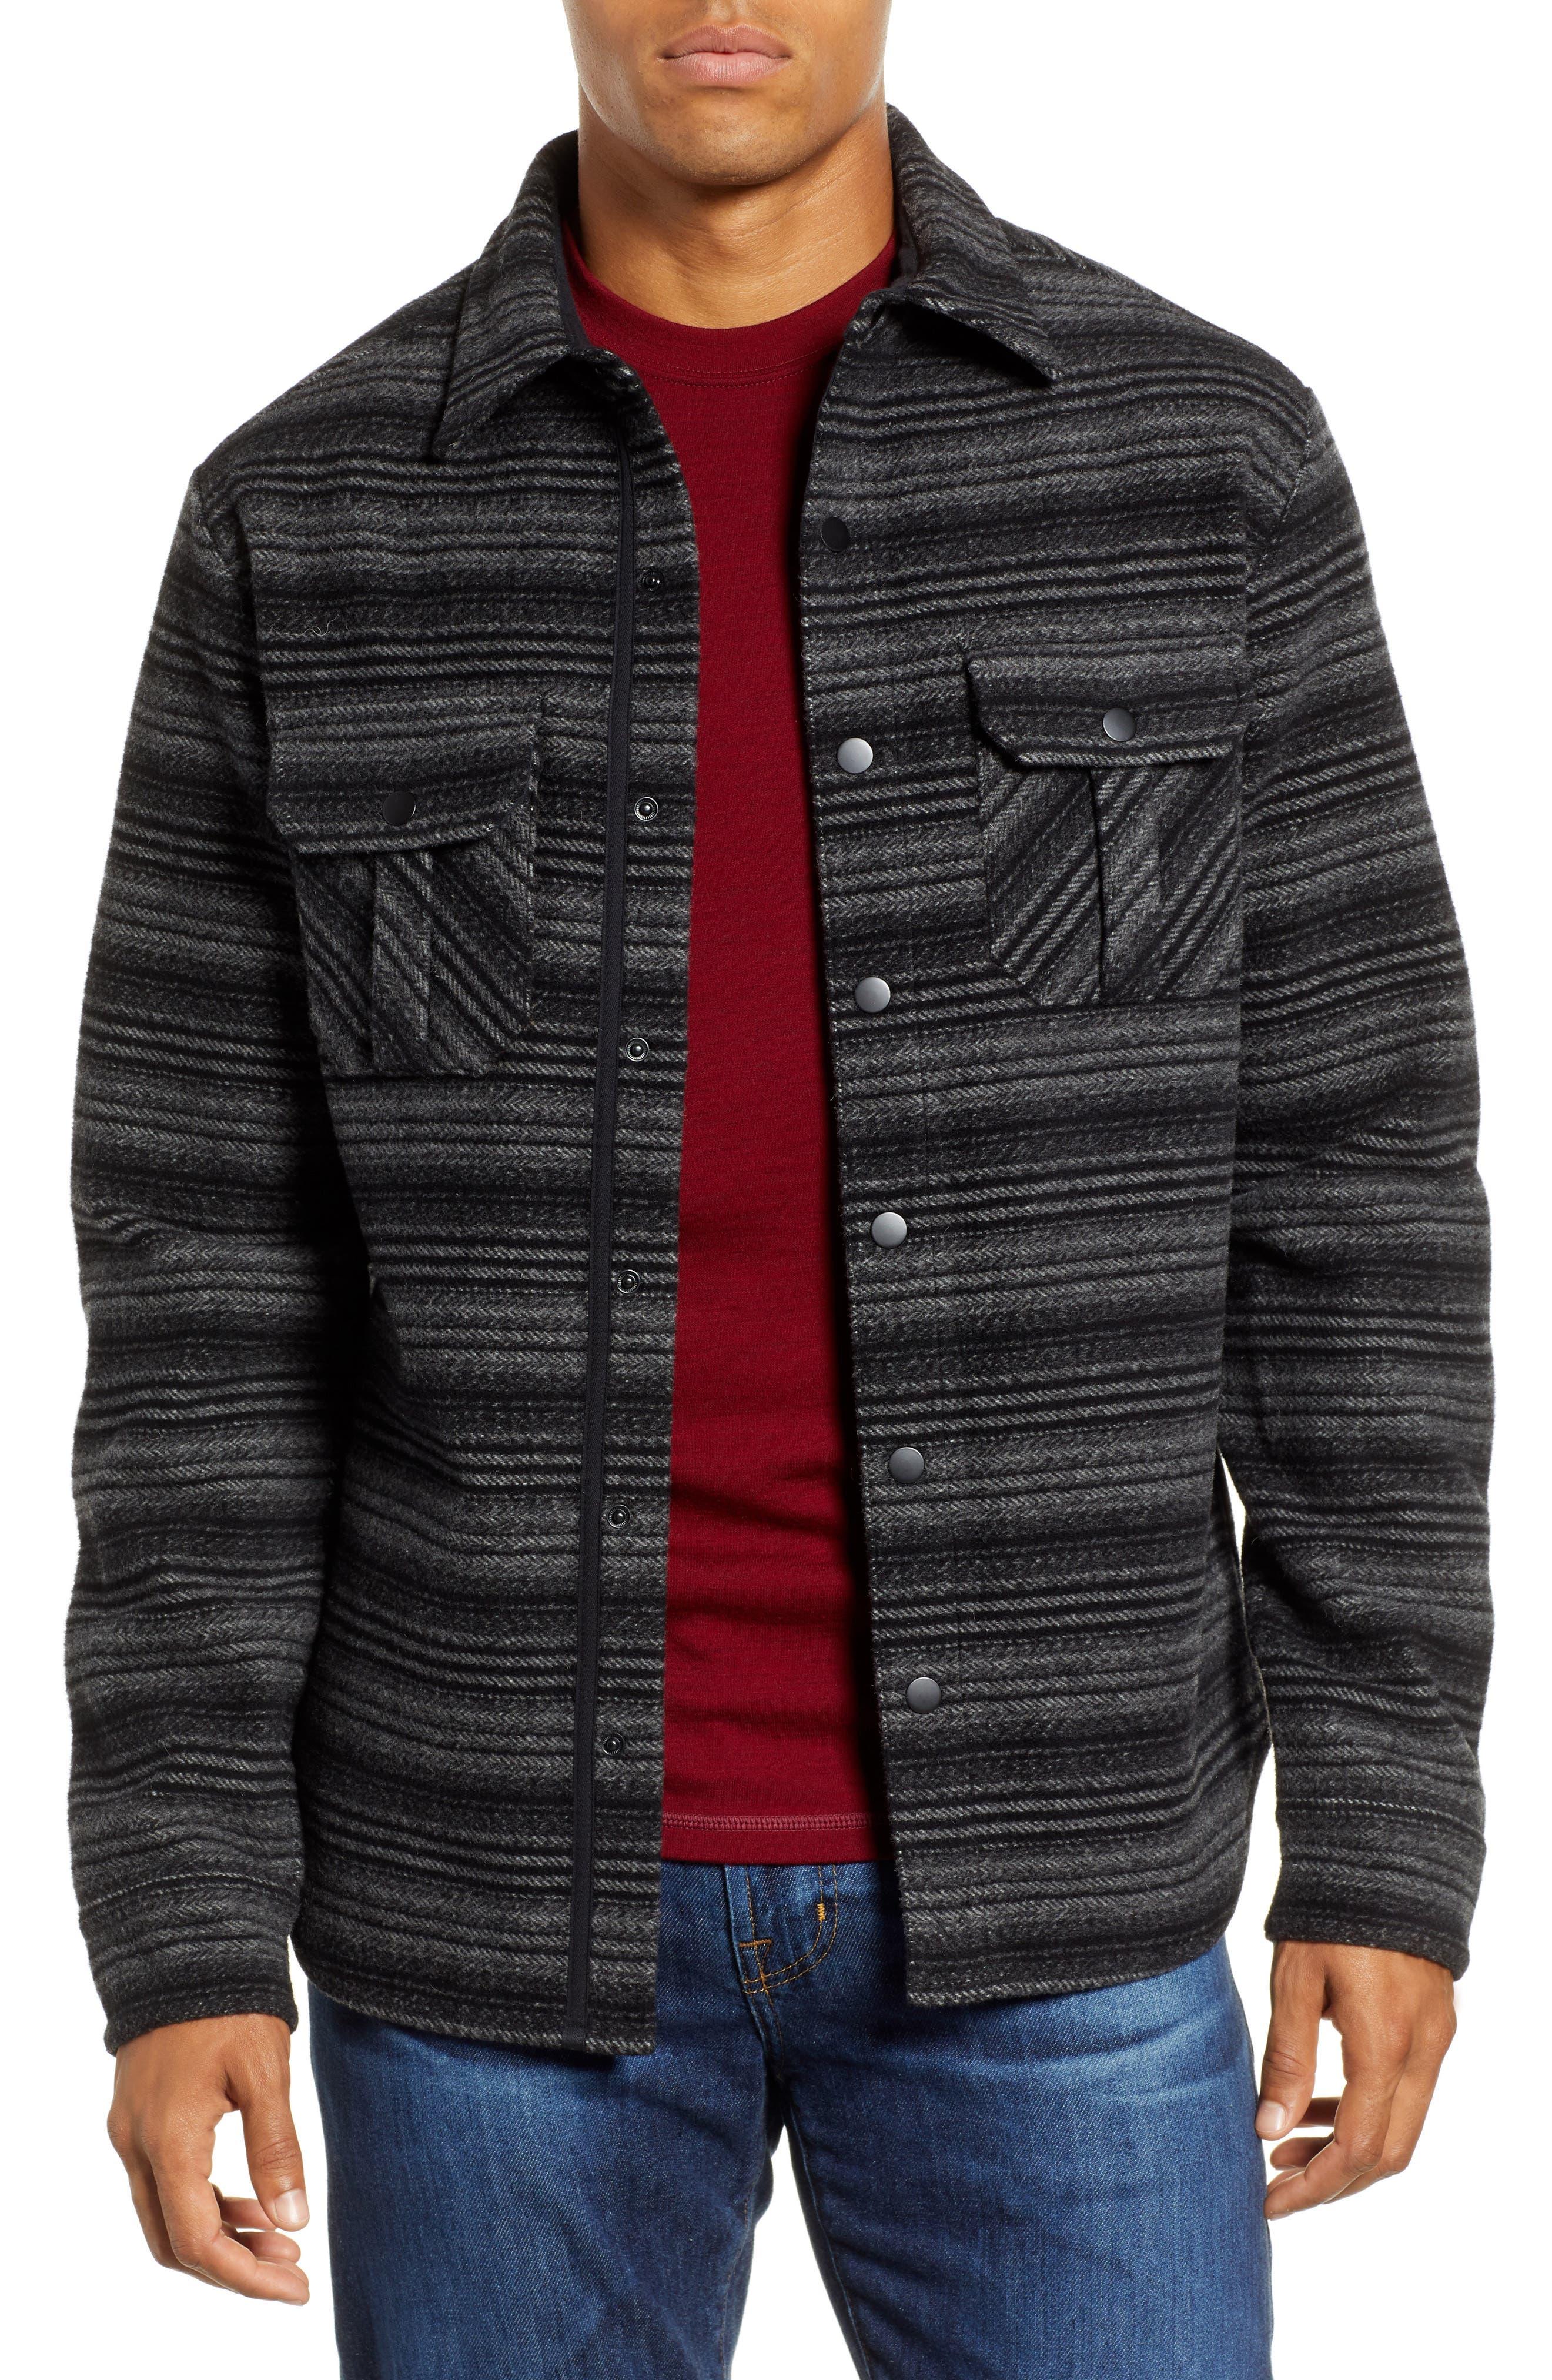 Anchor Line Flannel Shirt Jacket,                             Main thumbnail 1, color,                             MEDIUM GREY/ BLACK